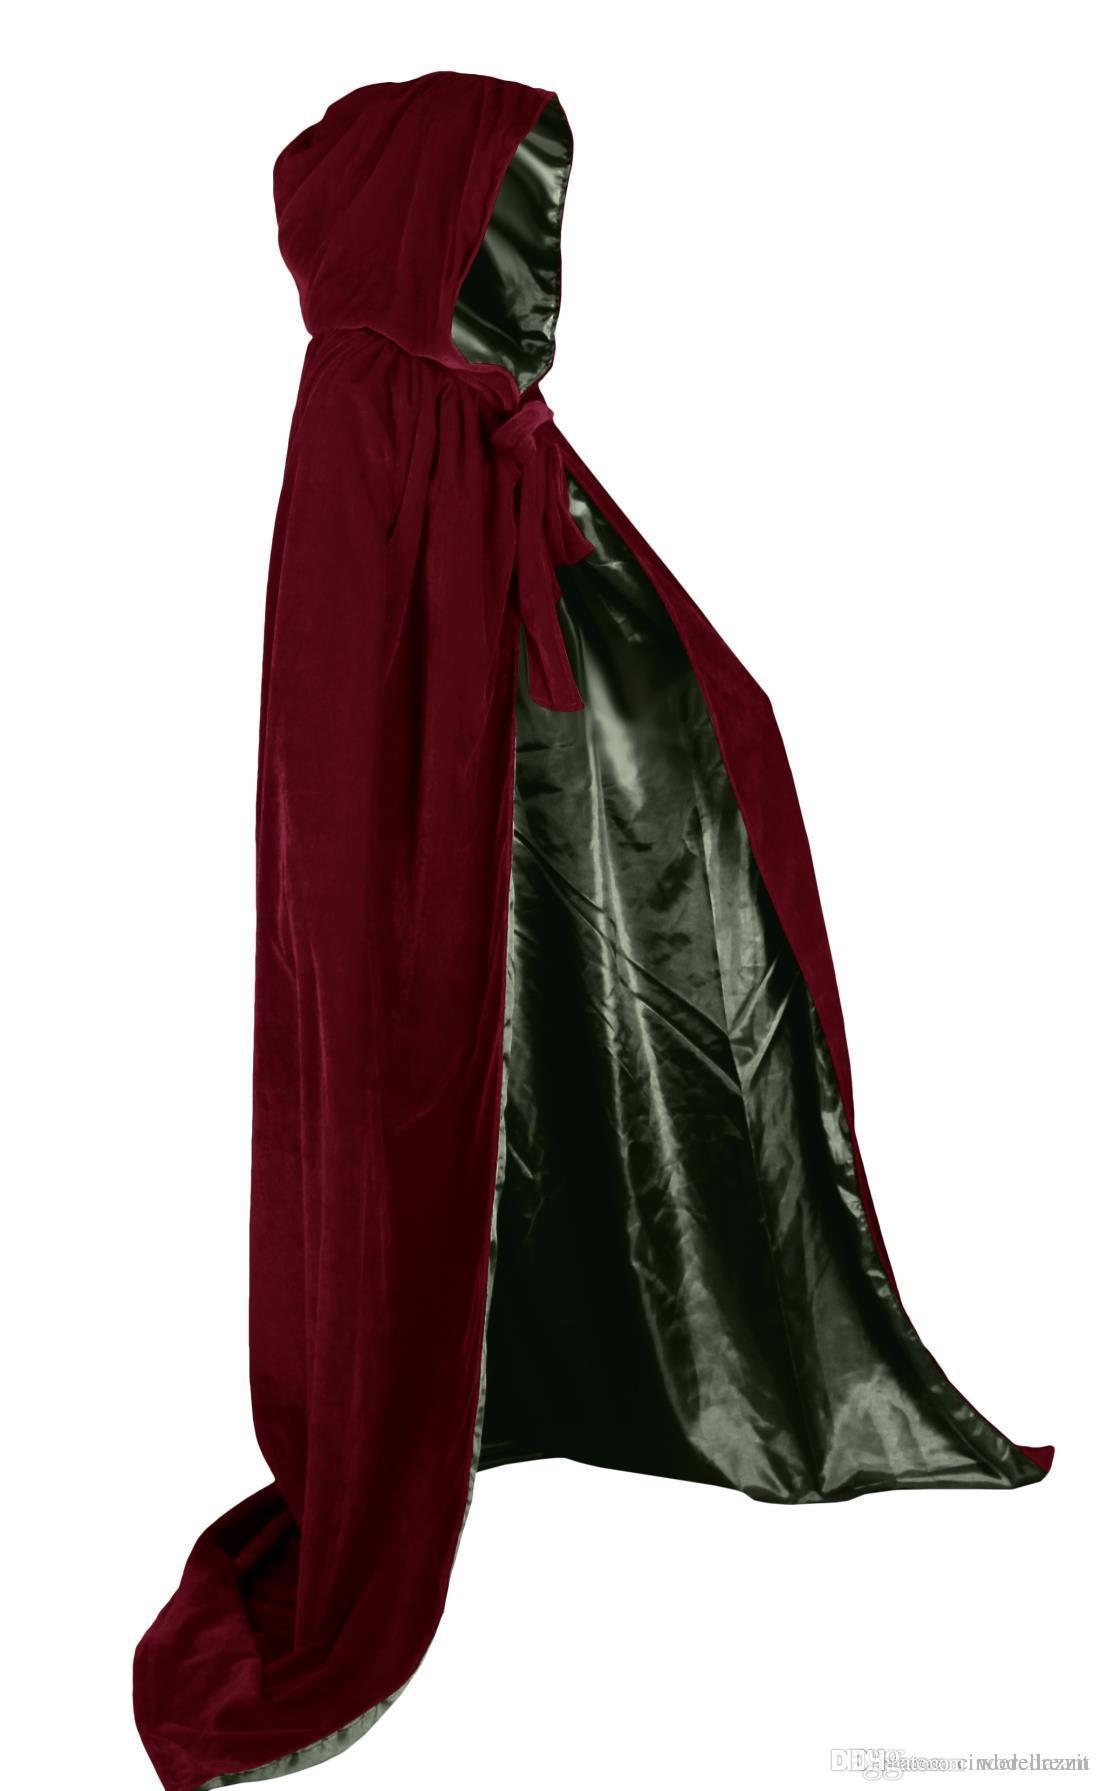 2019 Red Velvet Hooded Cloak Long Wedding Cape Halloween Plus Size S-XXL